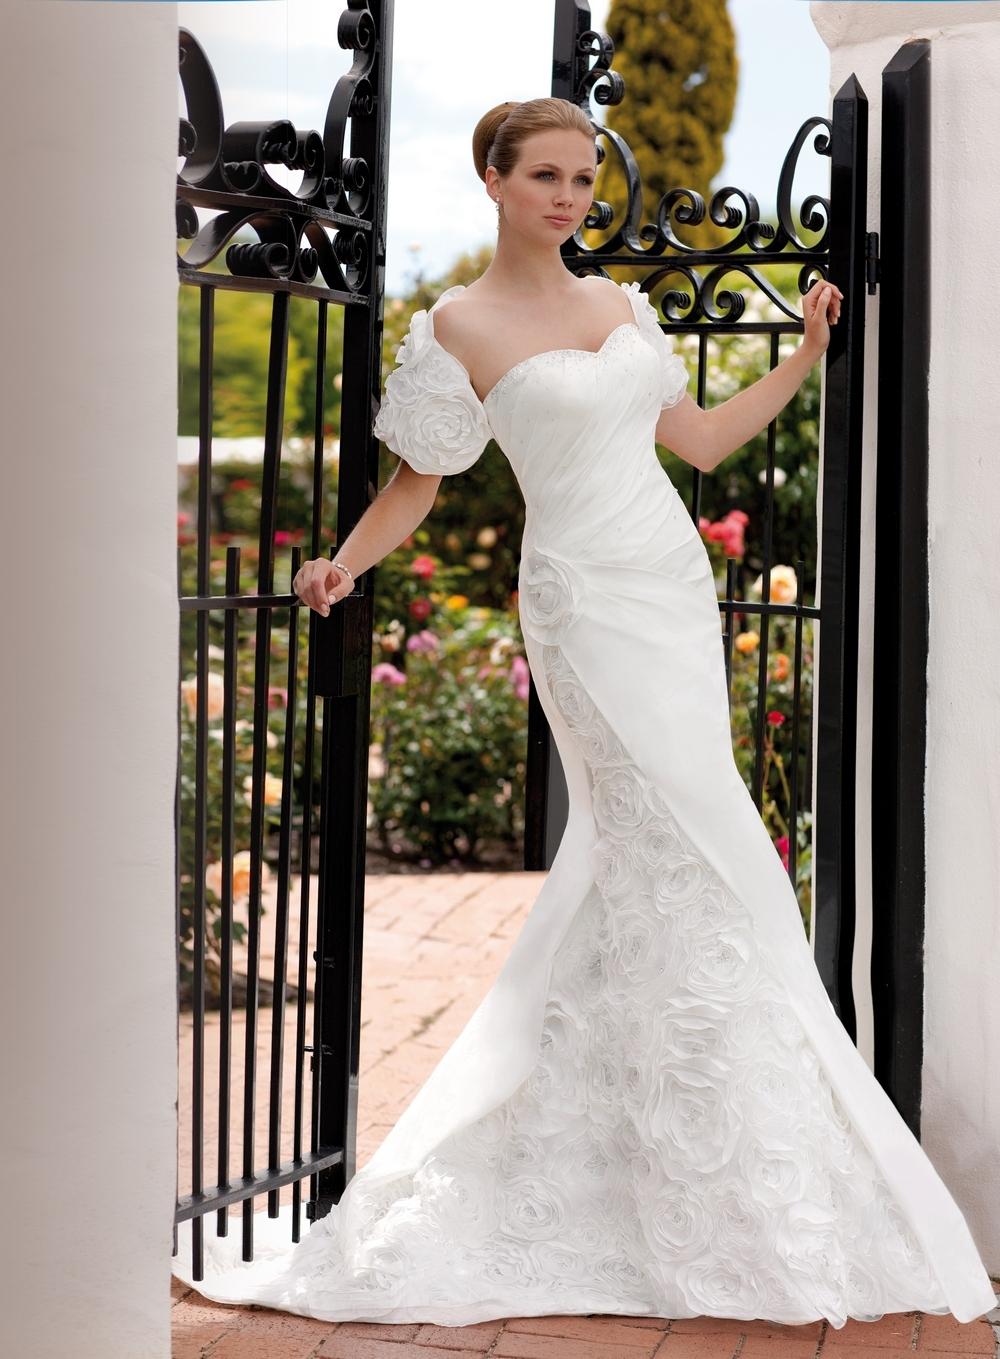 Essense-of-australia-wedding-dresses-2010-2011-d1088.full